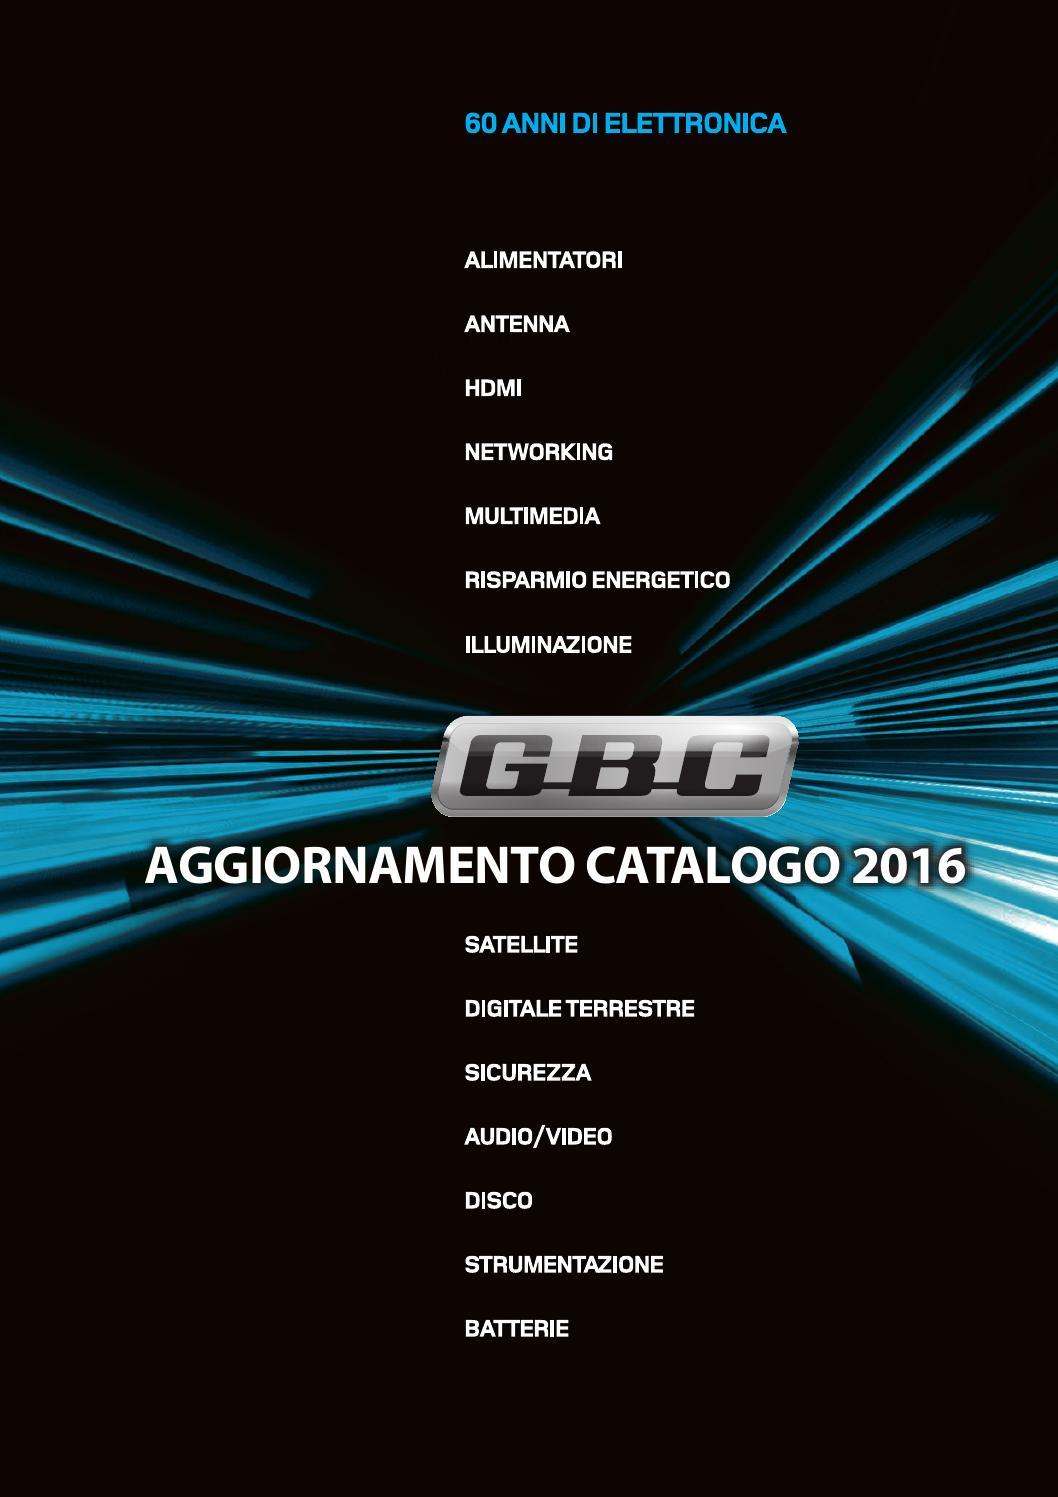 Velleman Projects Catalogue En By Nv Issuu 230v Rund Led Driver 700ma 13 3w Leds Matronics Aggiornamento Catalogo Gbc 2016